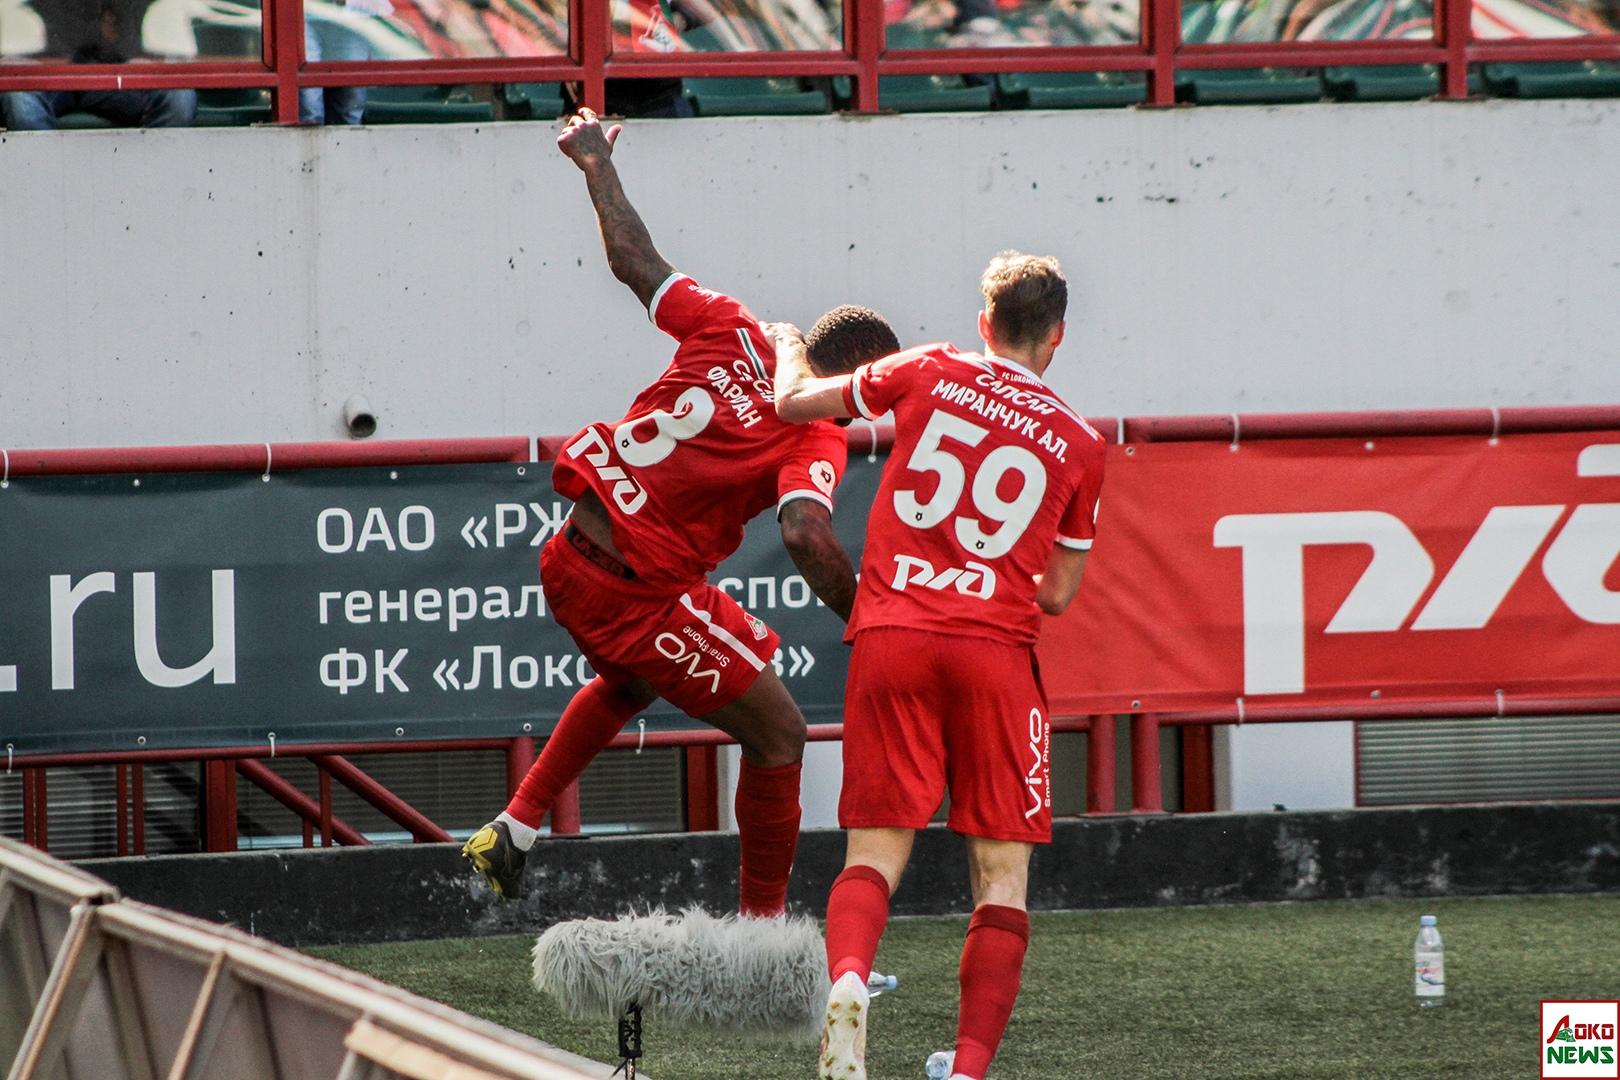 Локомотив - Енисей. Фото: Дмитрий Бурдонов / Loko.News